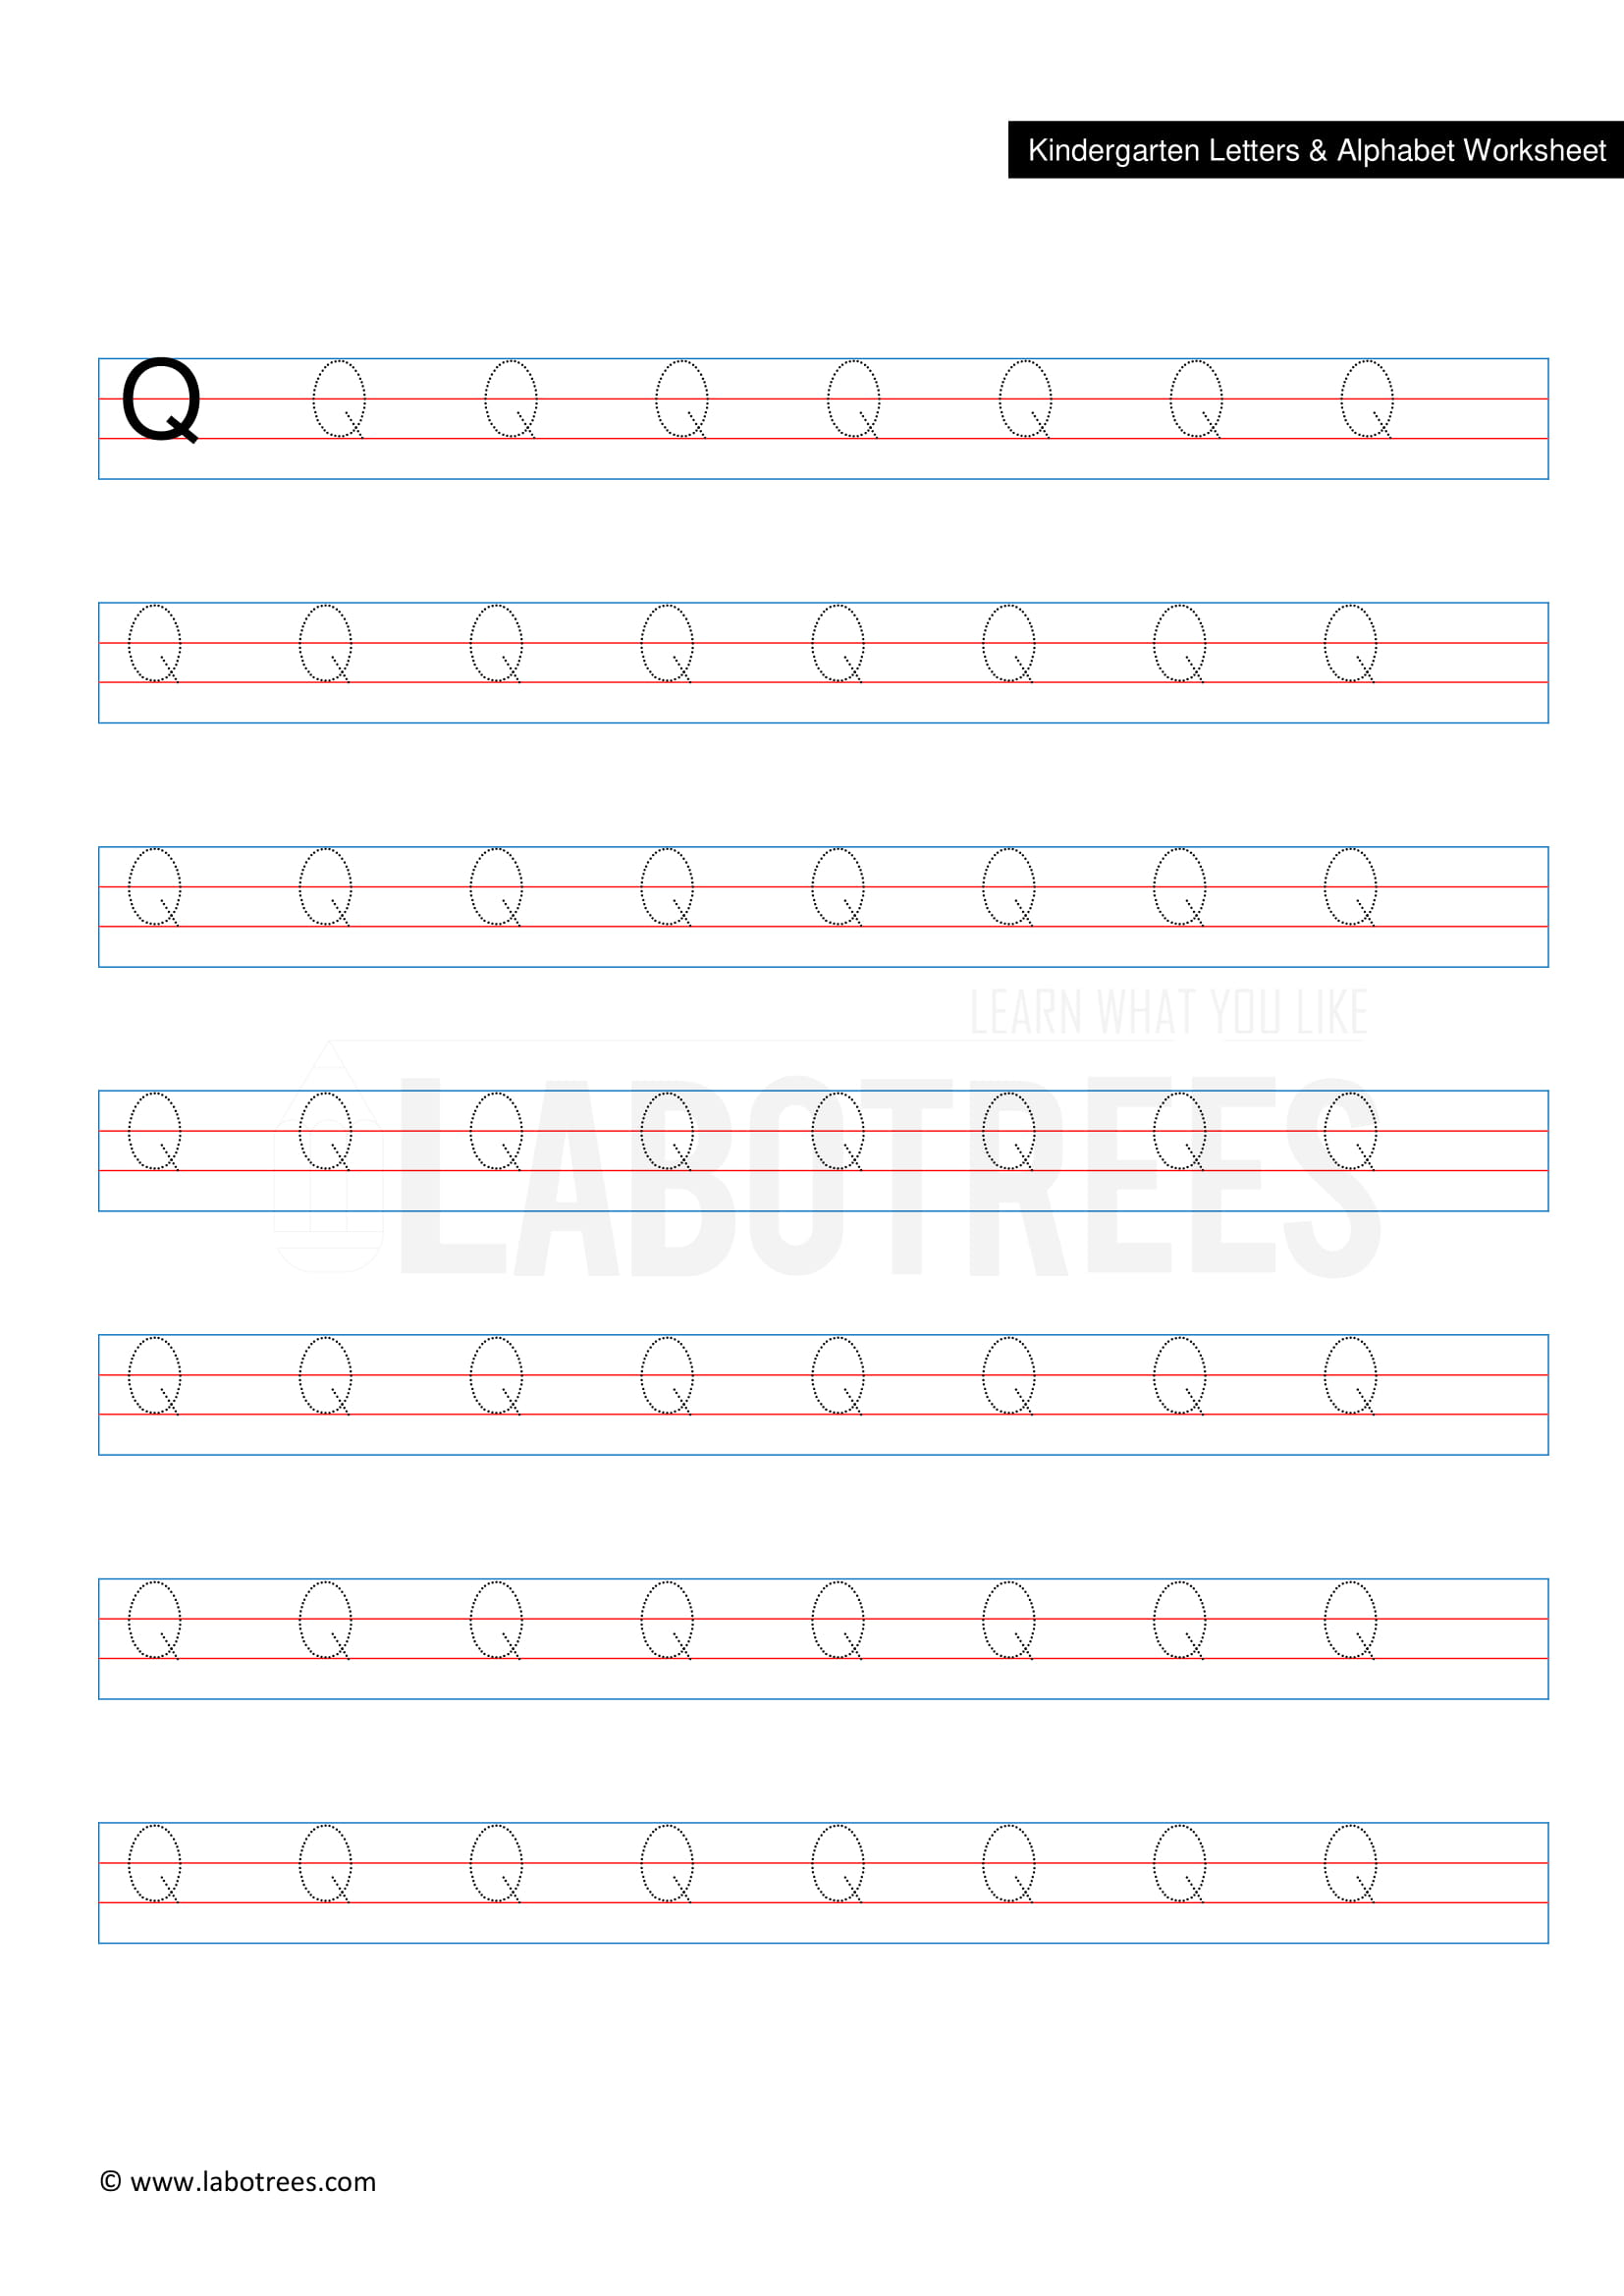 Worksheet Of Letter Q Uppercase Free Download